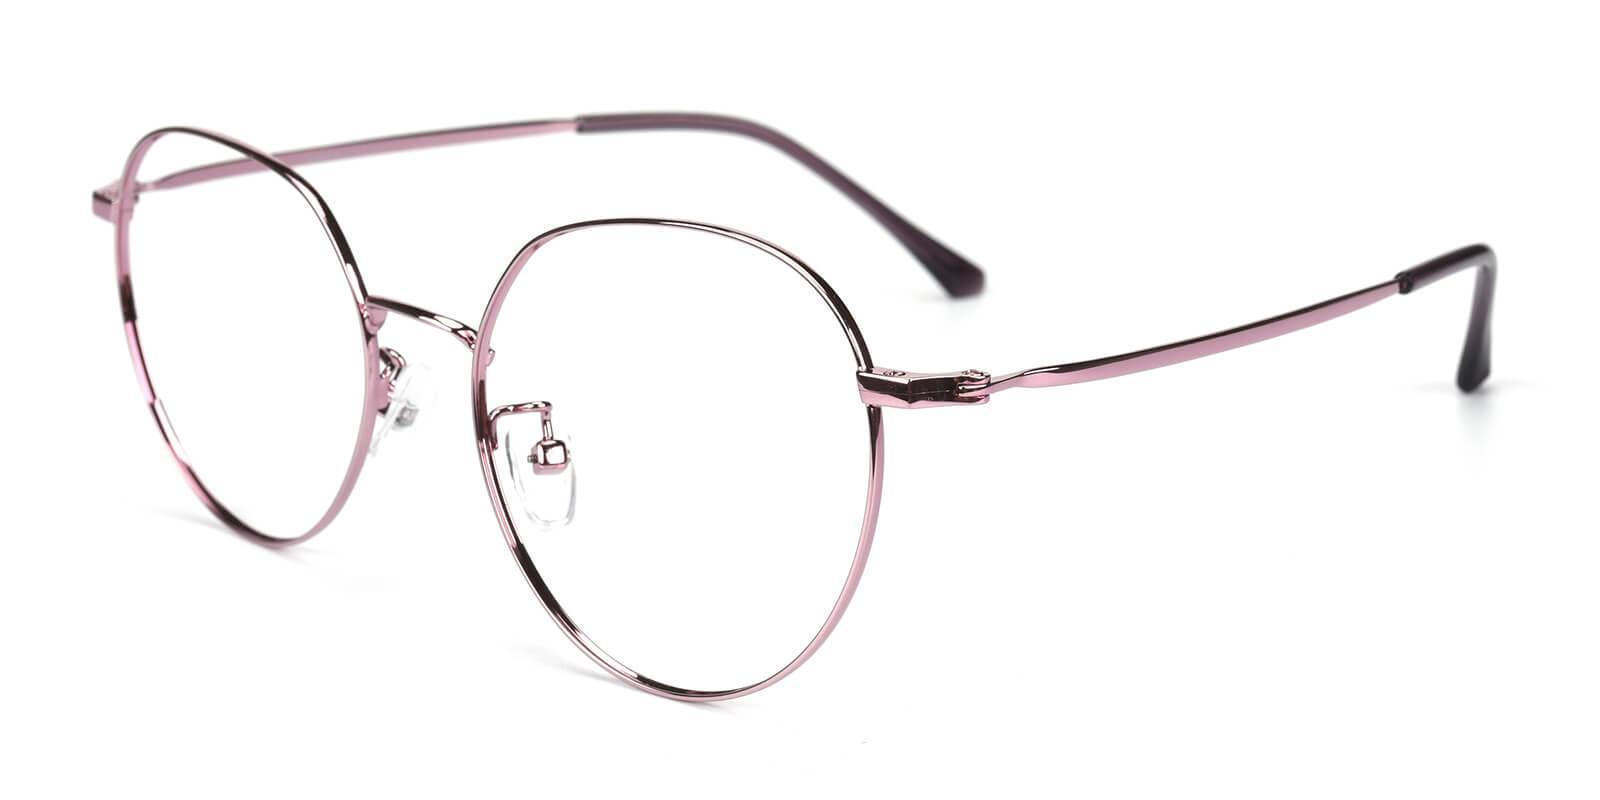 Amorous-Purple-Round-Metal-Eyeglasses-additional1